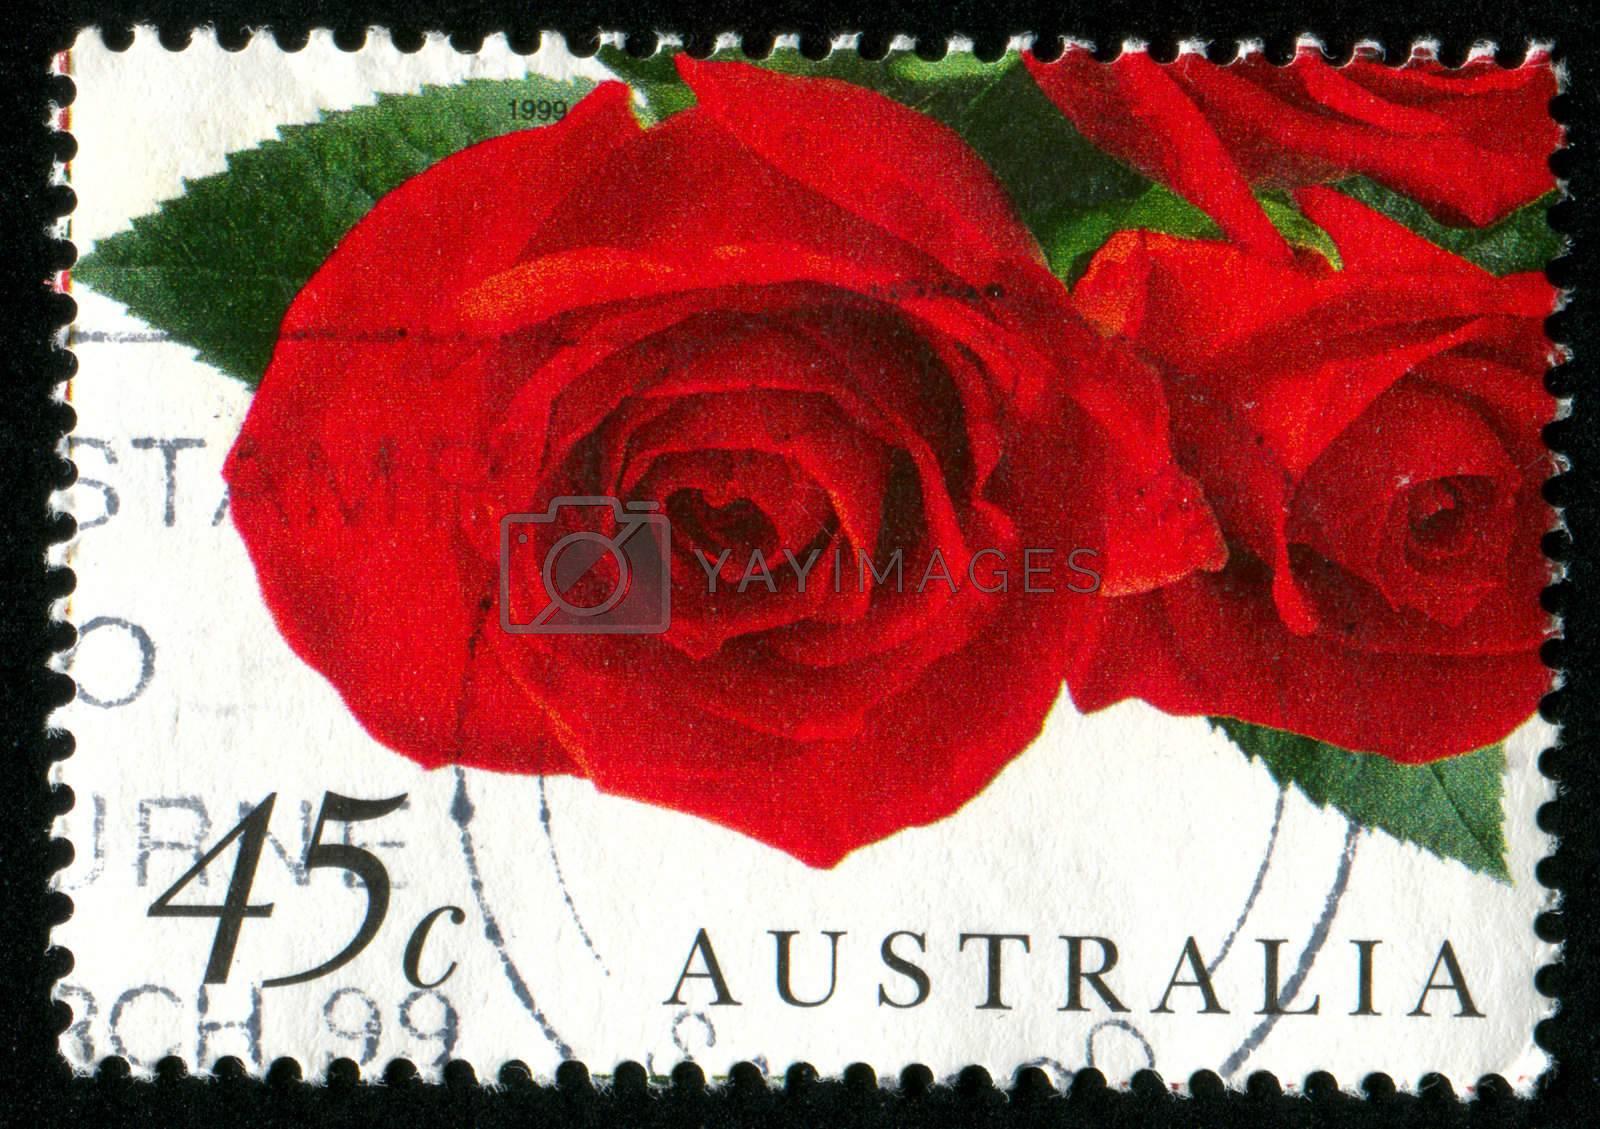 AUSTRALIA - CIRCA 1999: stamp printed by Australia, shows rose, circa 1999